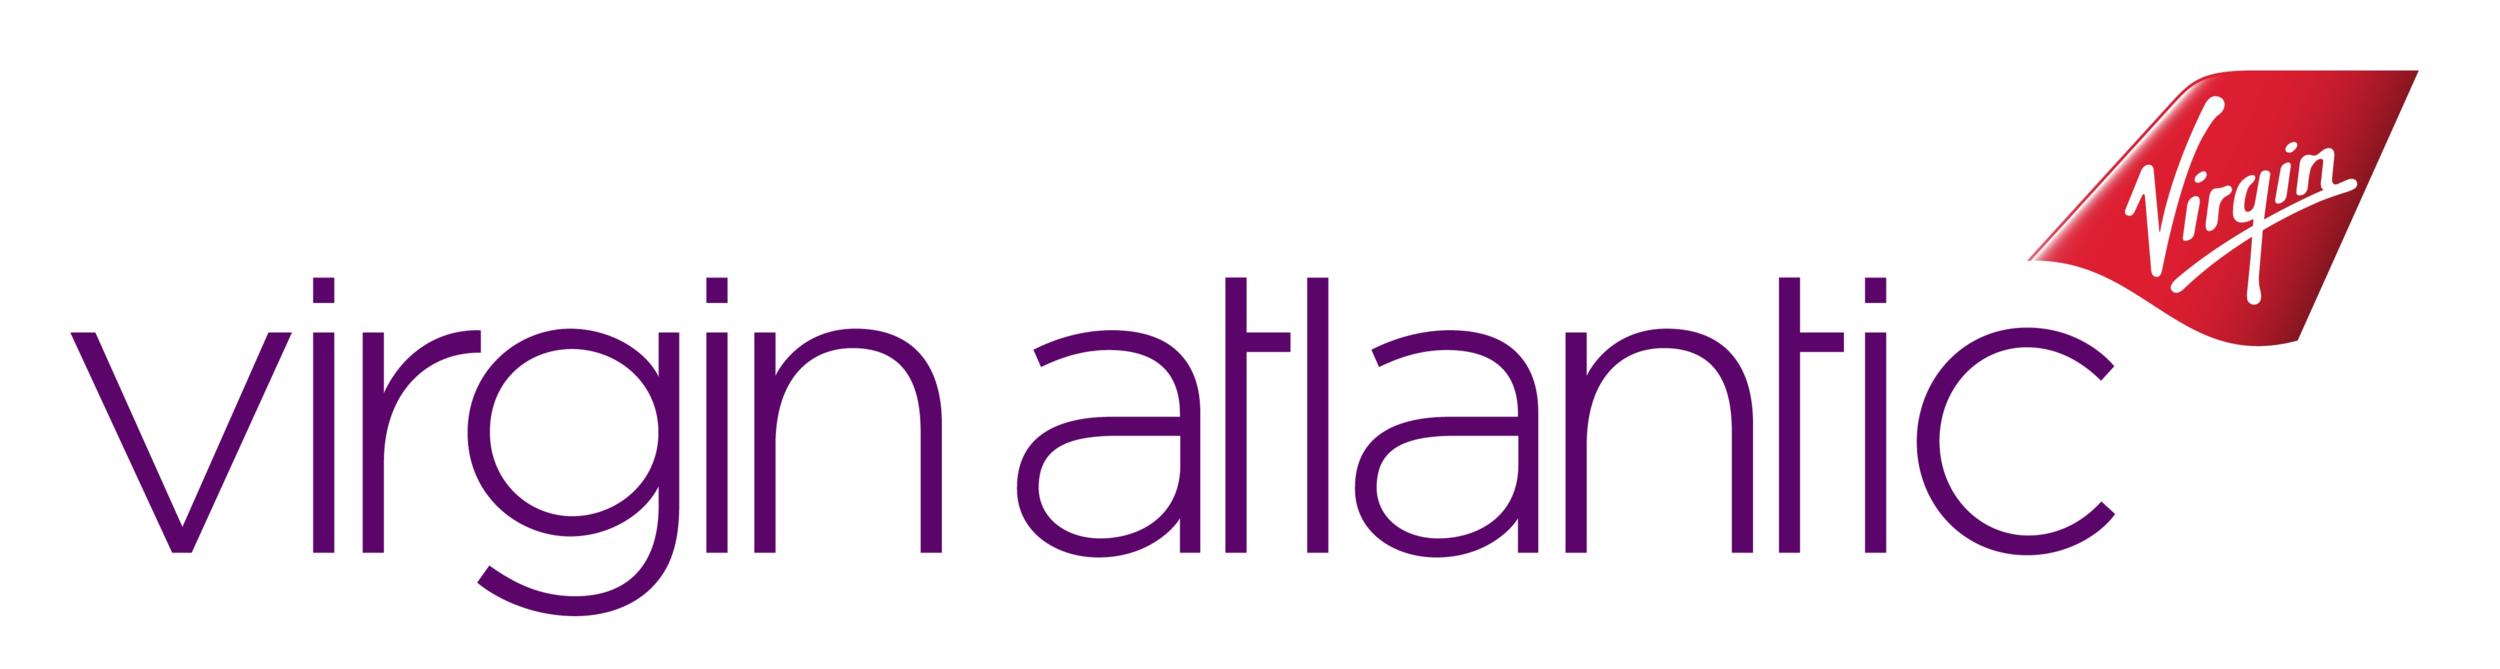 Virgin_Atlantic_logo_logotype.png